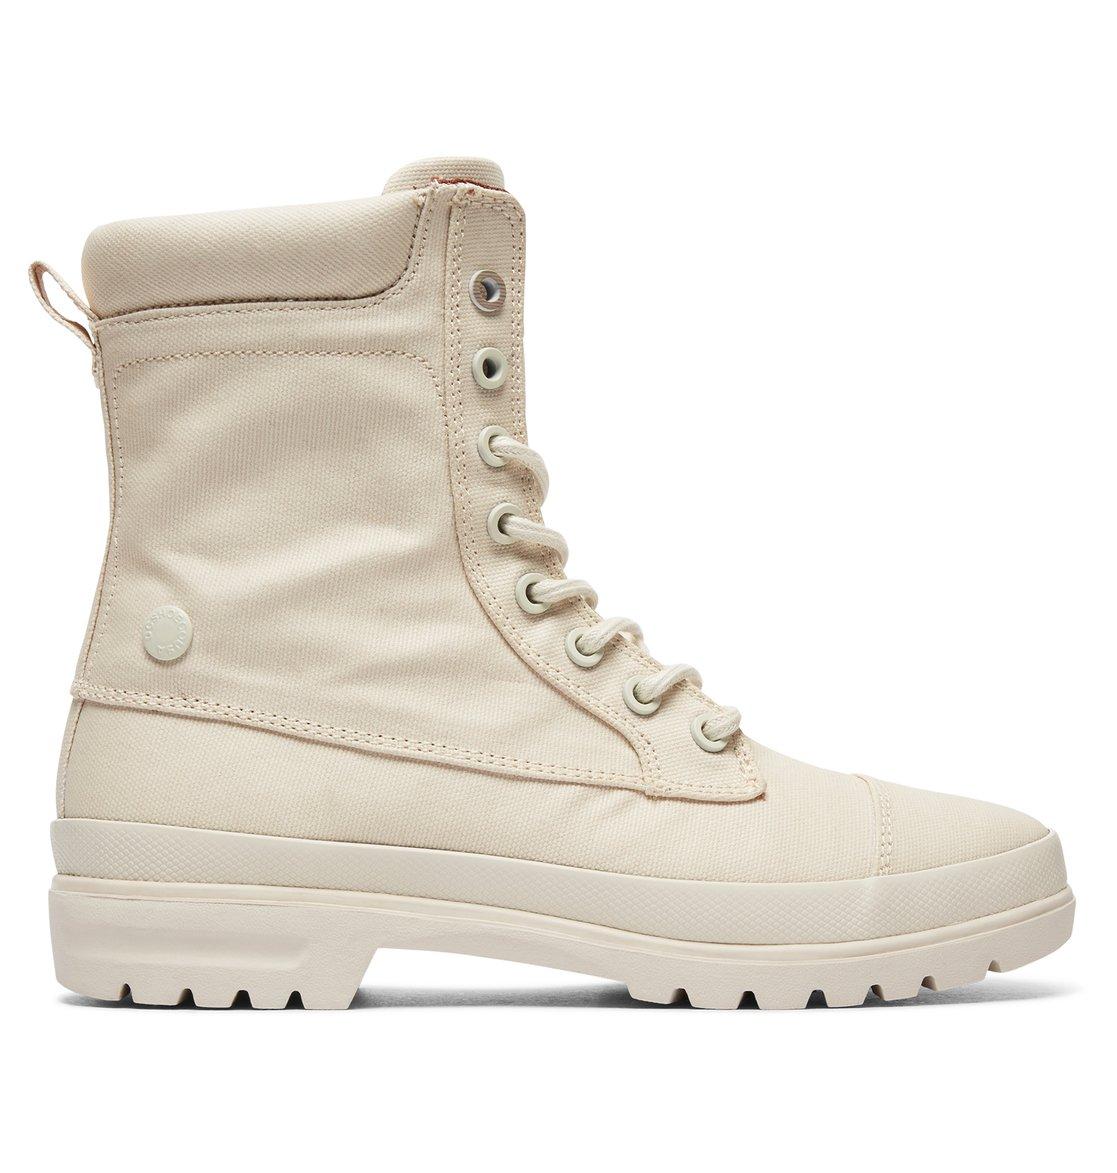 Women's Amnesti TX SE Lace-Up Boots